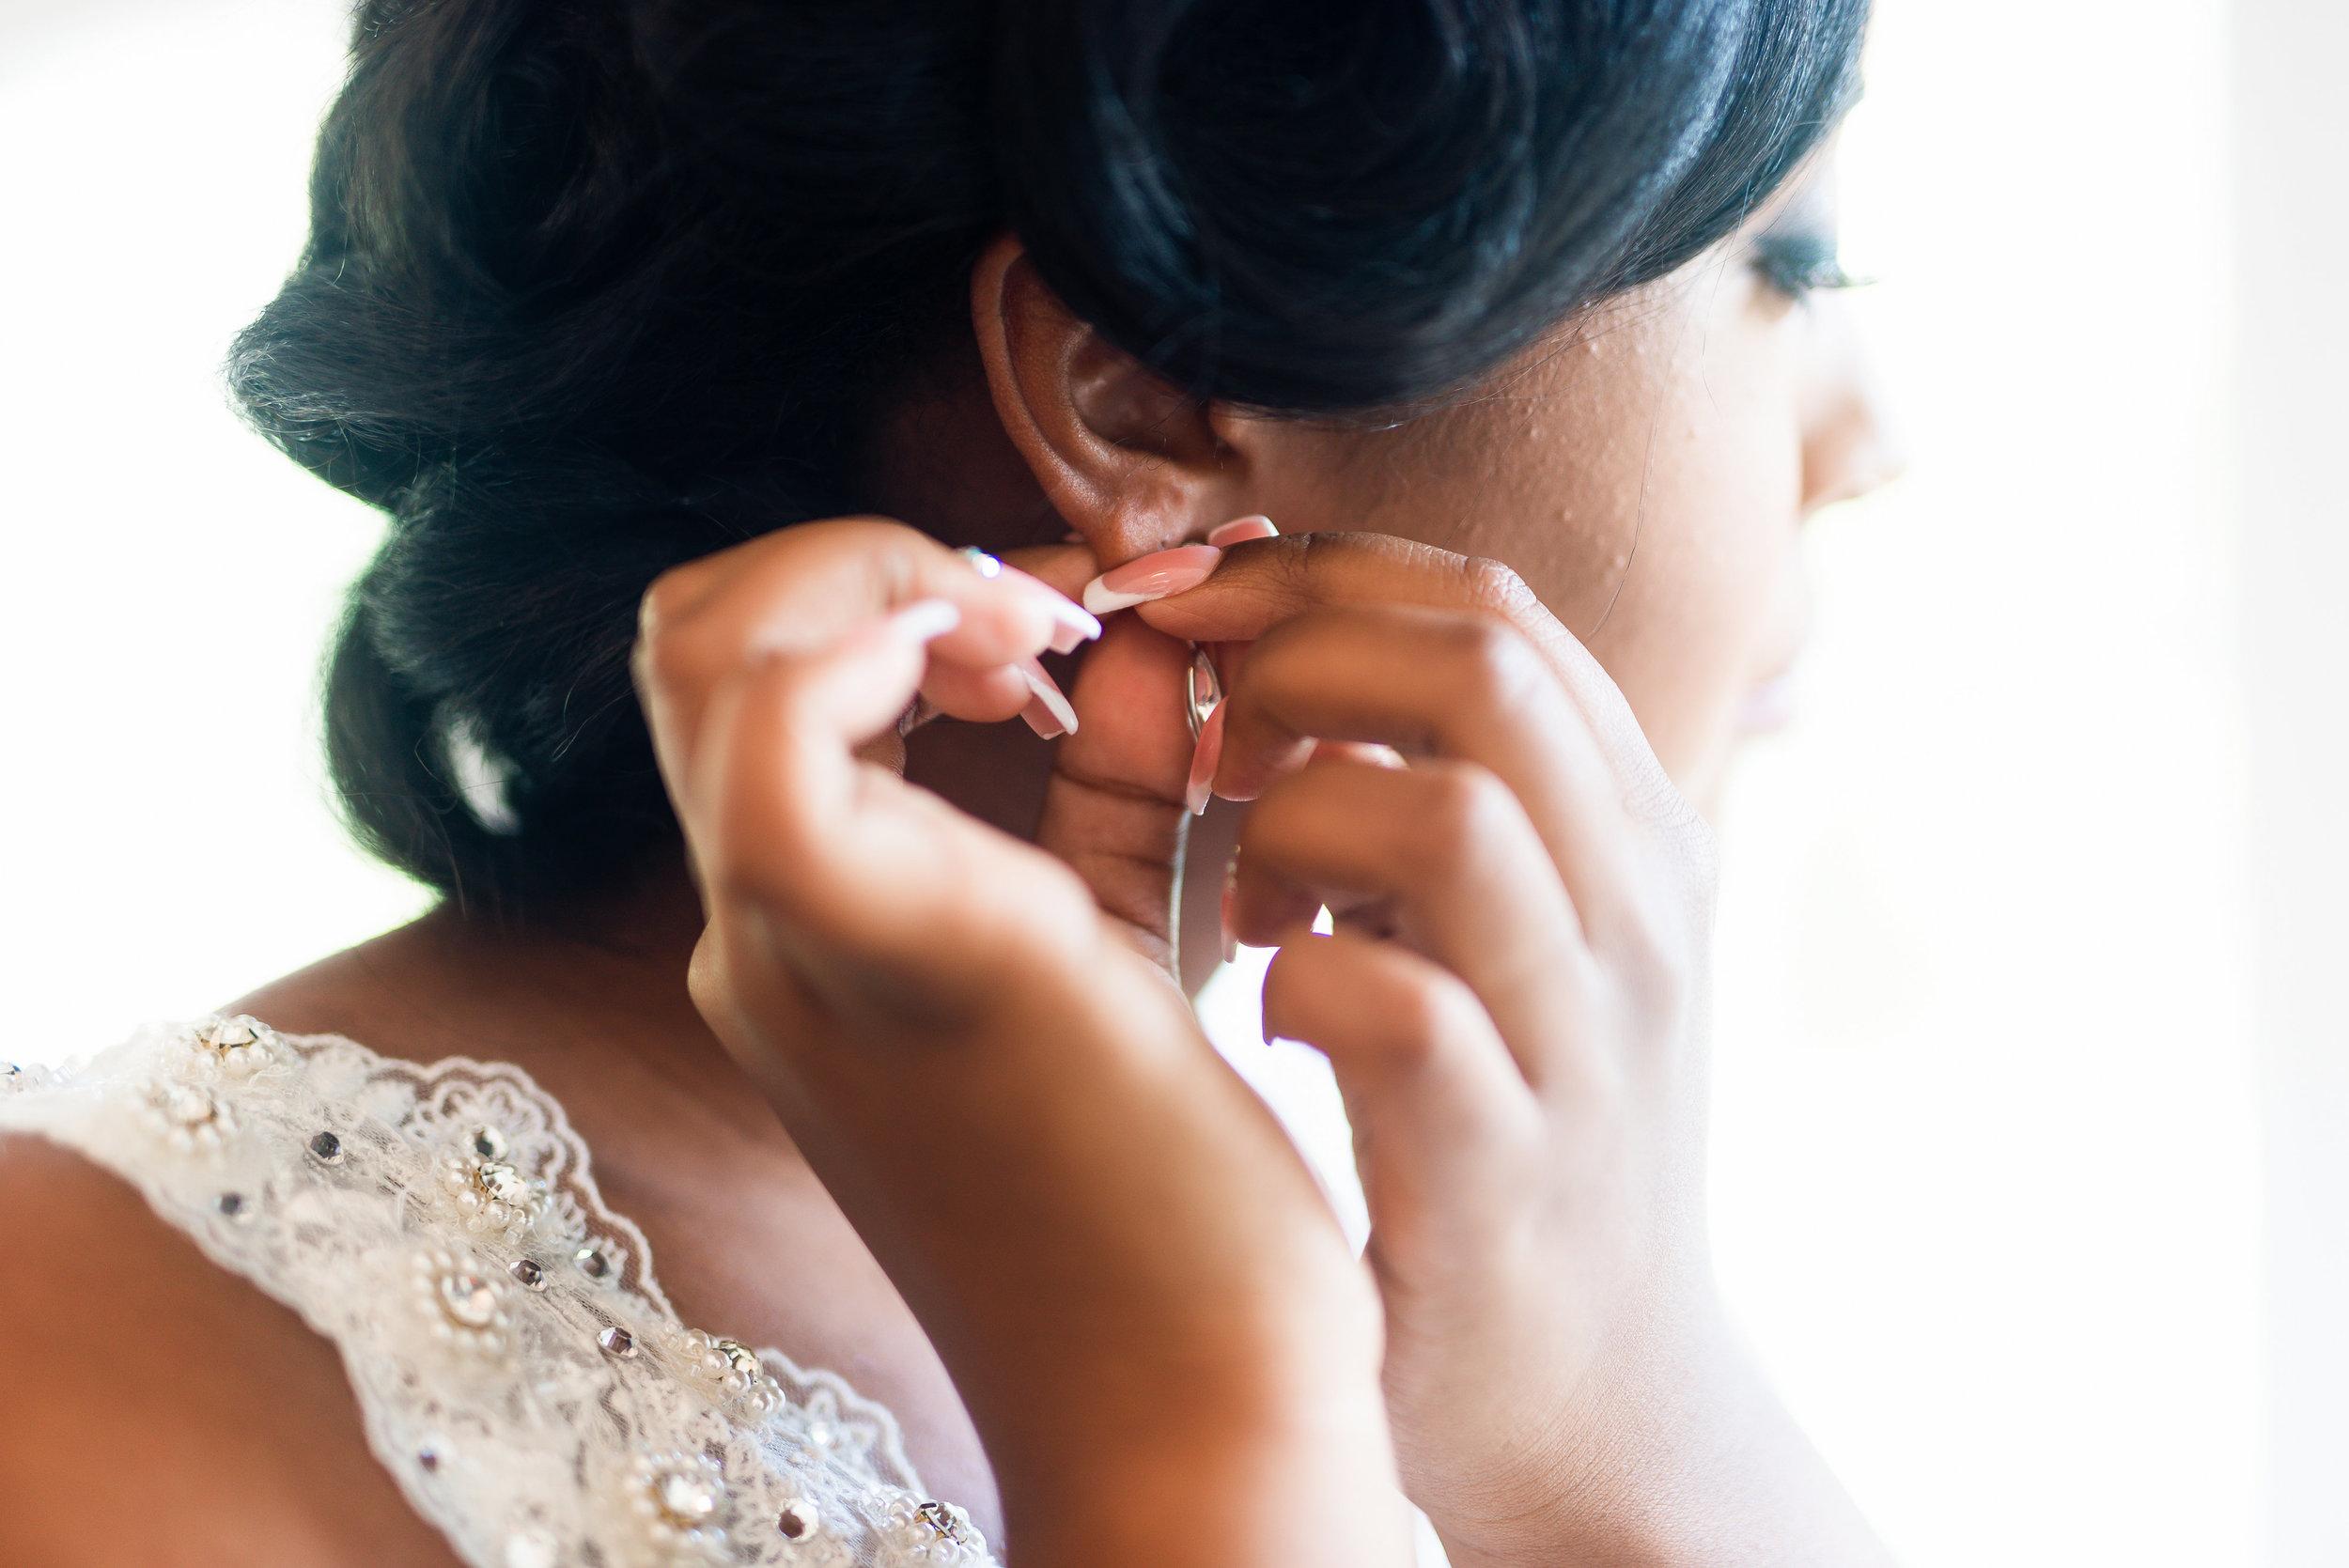 TC-Jessica-Garr-Pharris-Photography-Real-Wedding-18.jpg